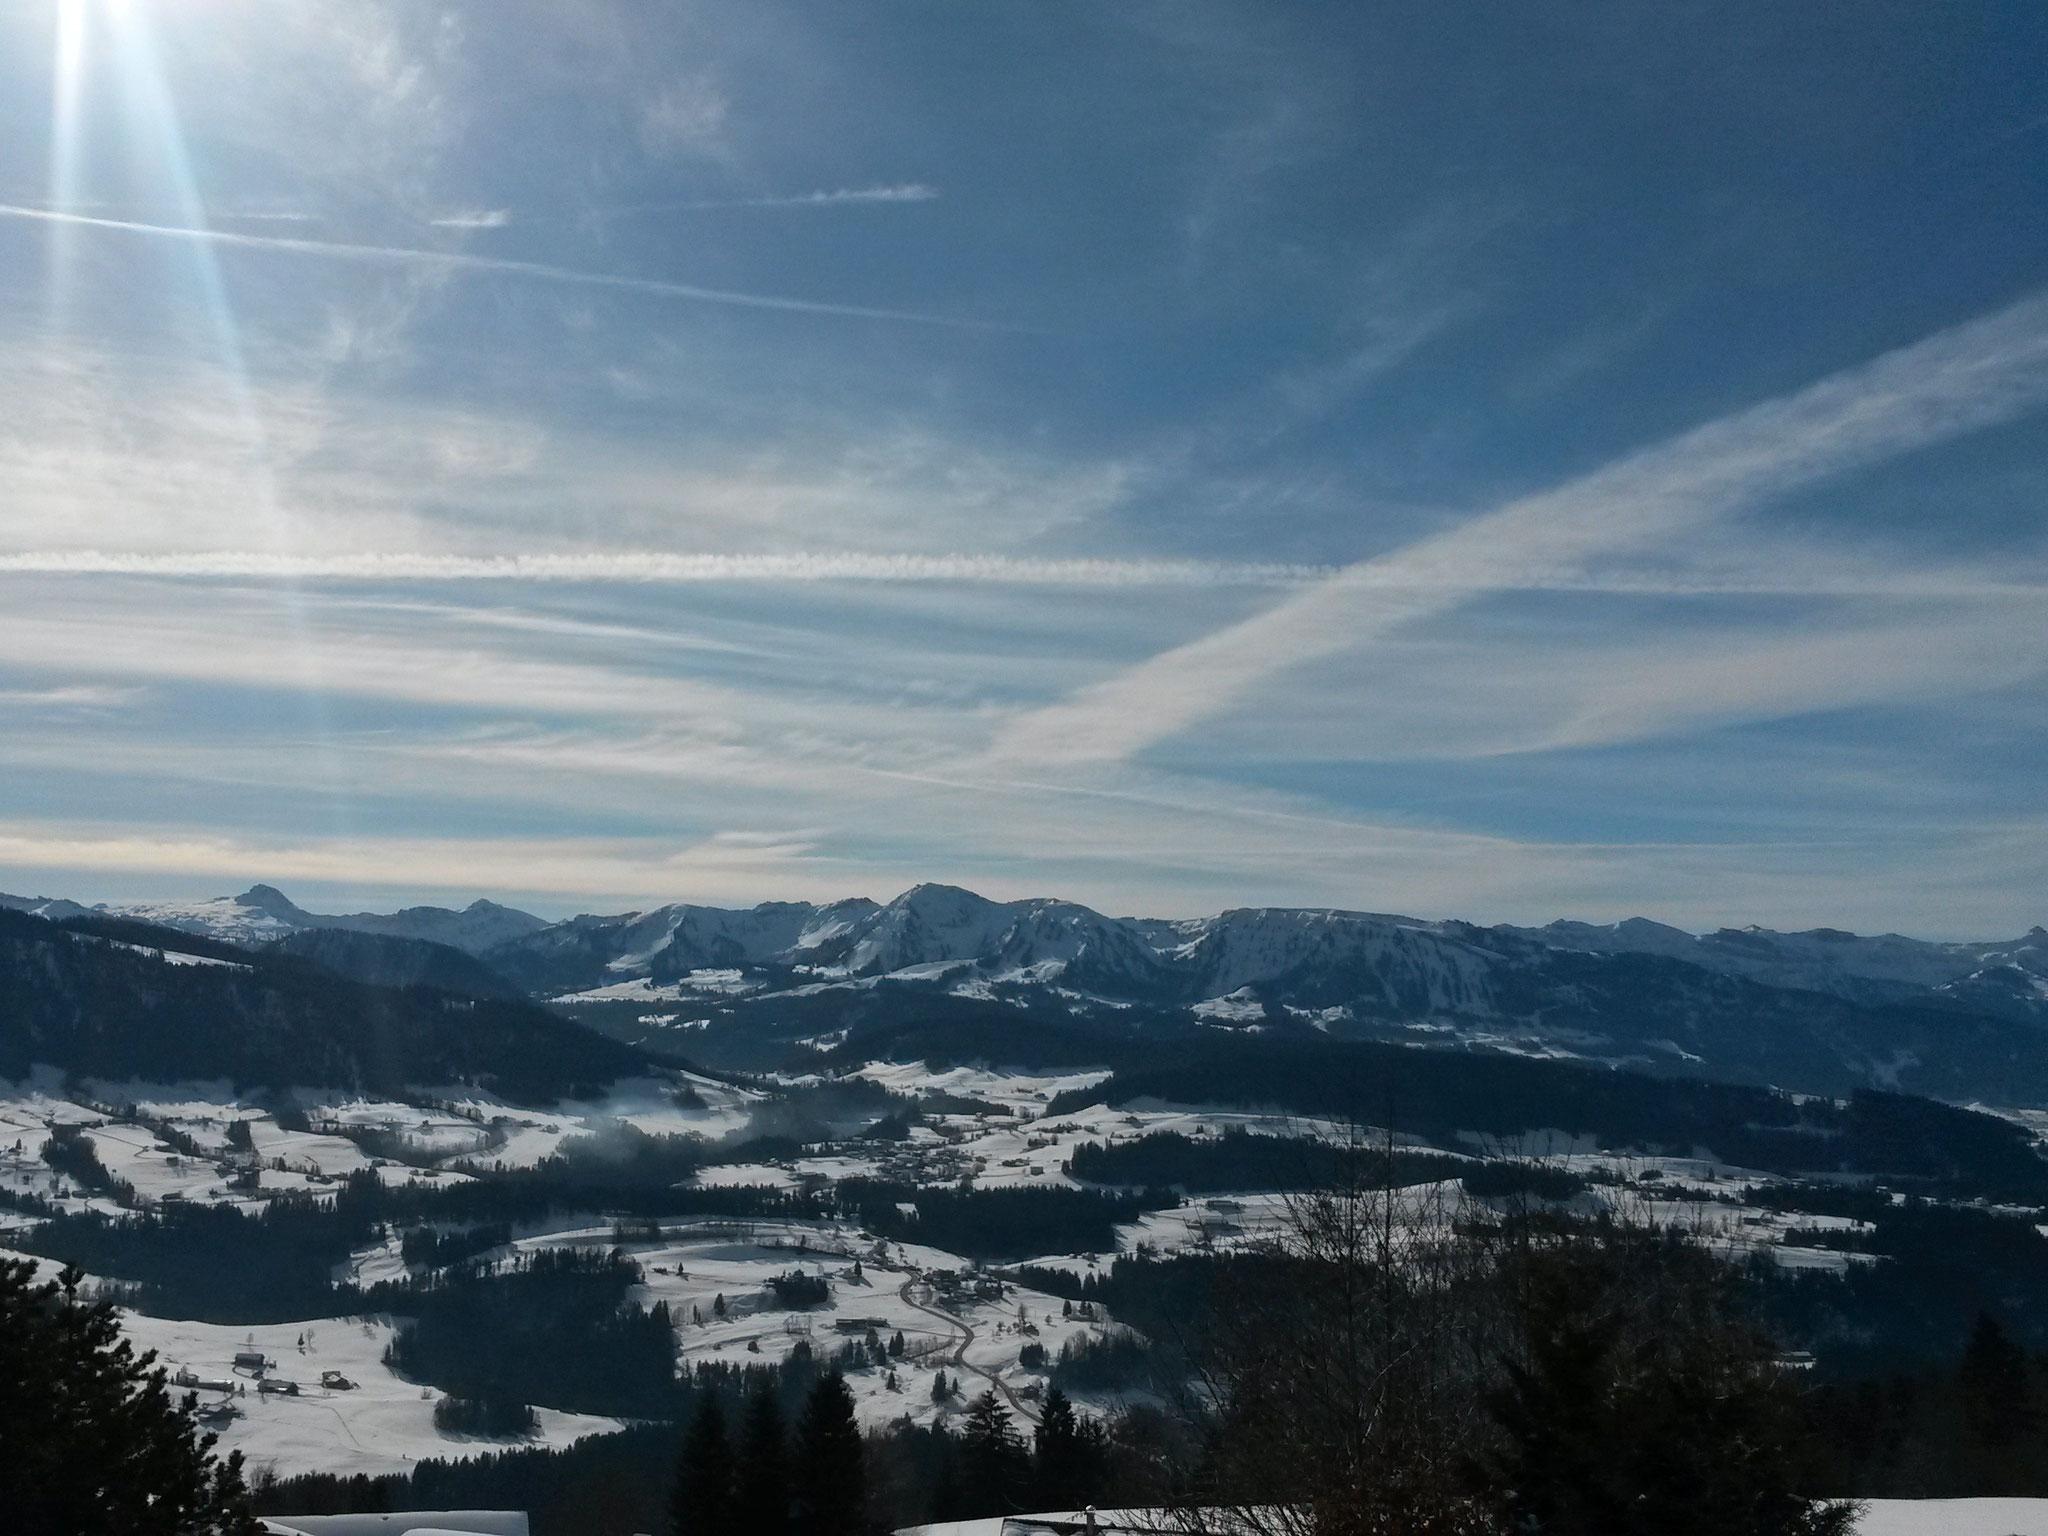 Blick vom Höhenweg in Sulzberg in die Berge